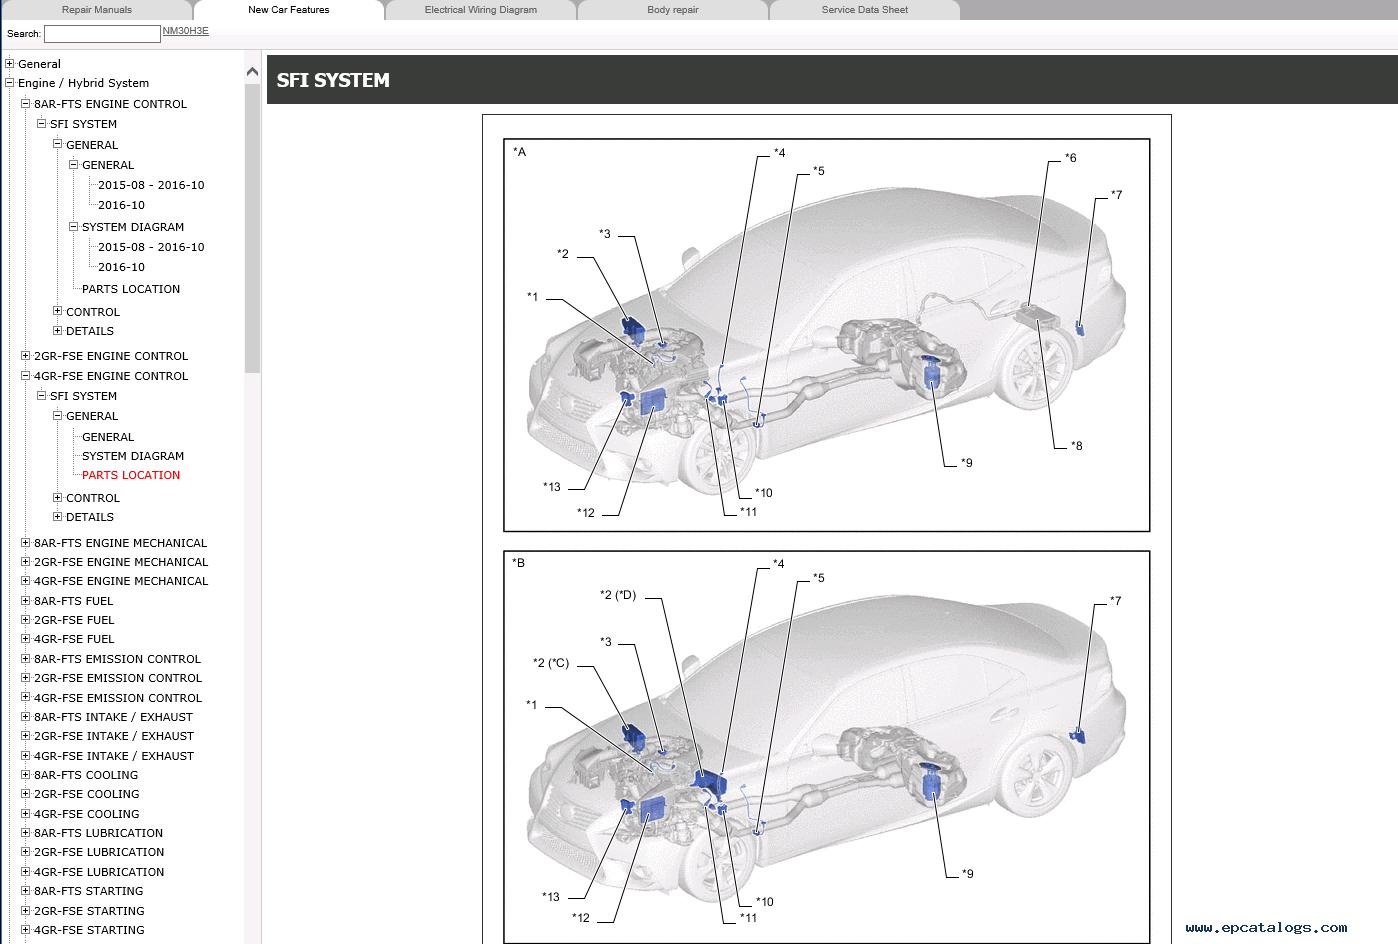 Lexu Repair Manual 1995 Lexus Es300 Service Fuse Box Diagram Hight Resolution Of Is200t Is250 04 2013 2